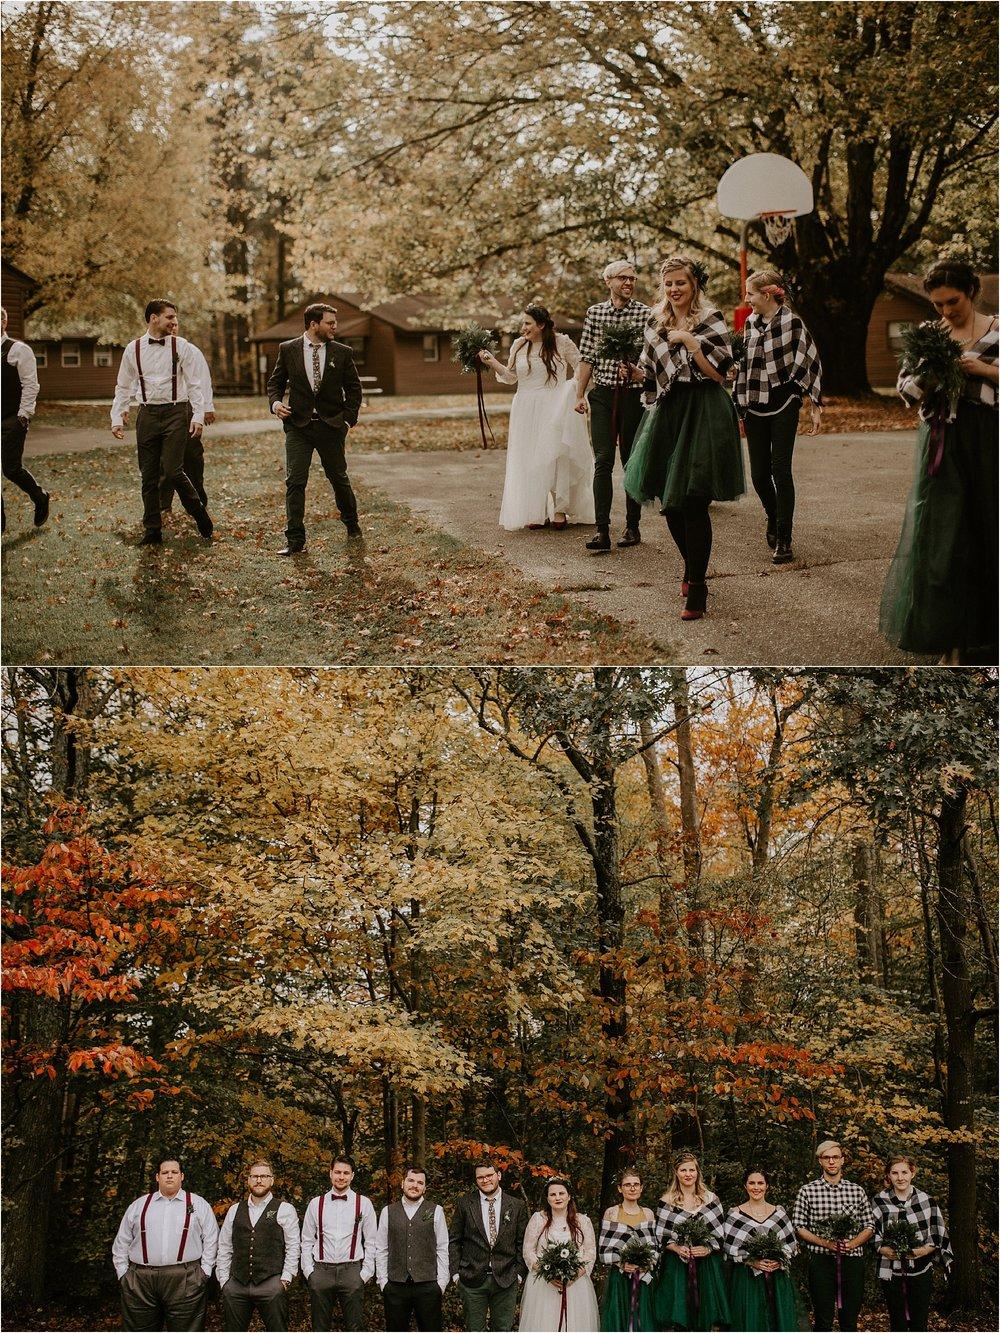 Sarah_Brookhart_Baltimore_Wedding_Photographer_0031.jpg